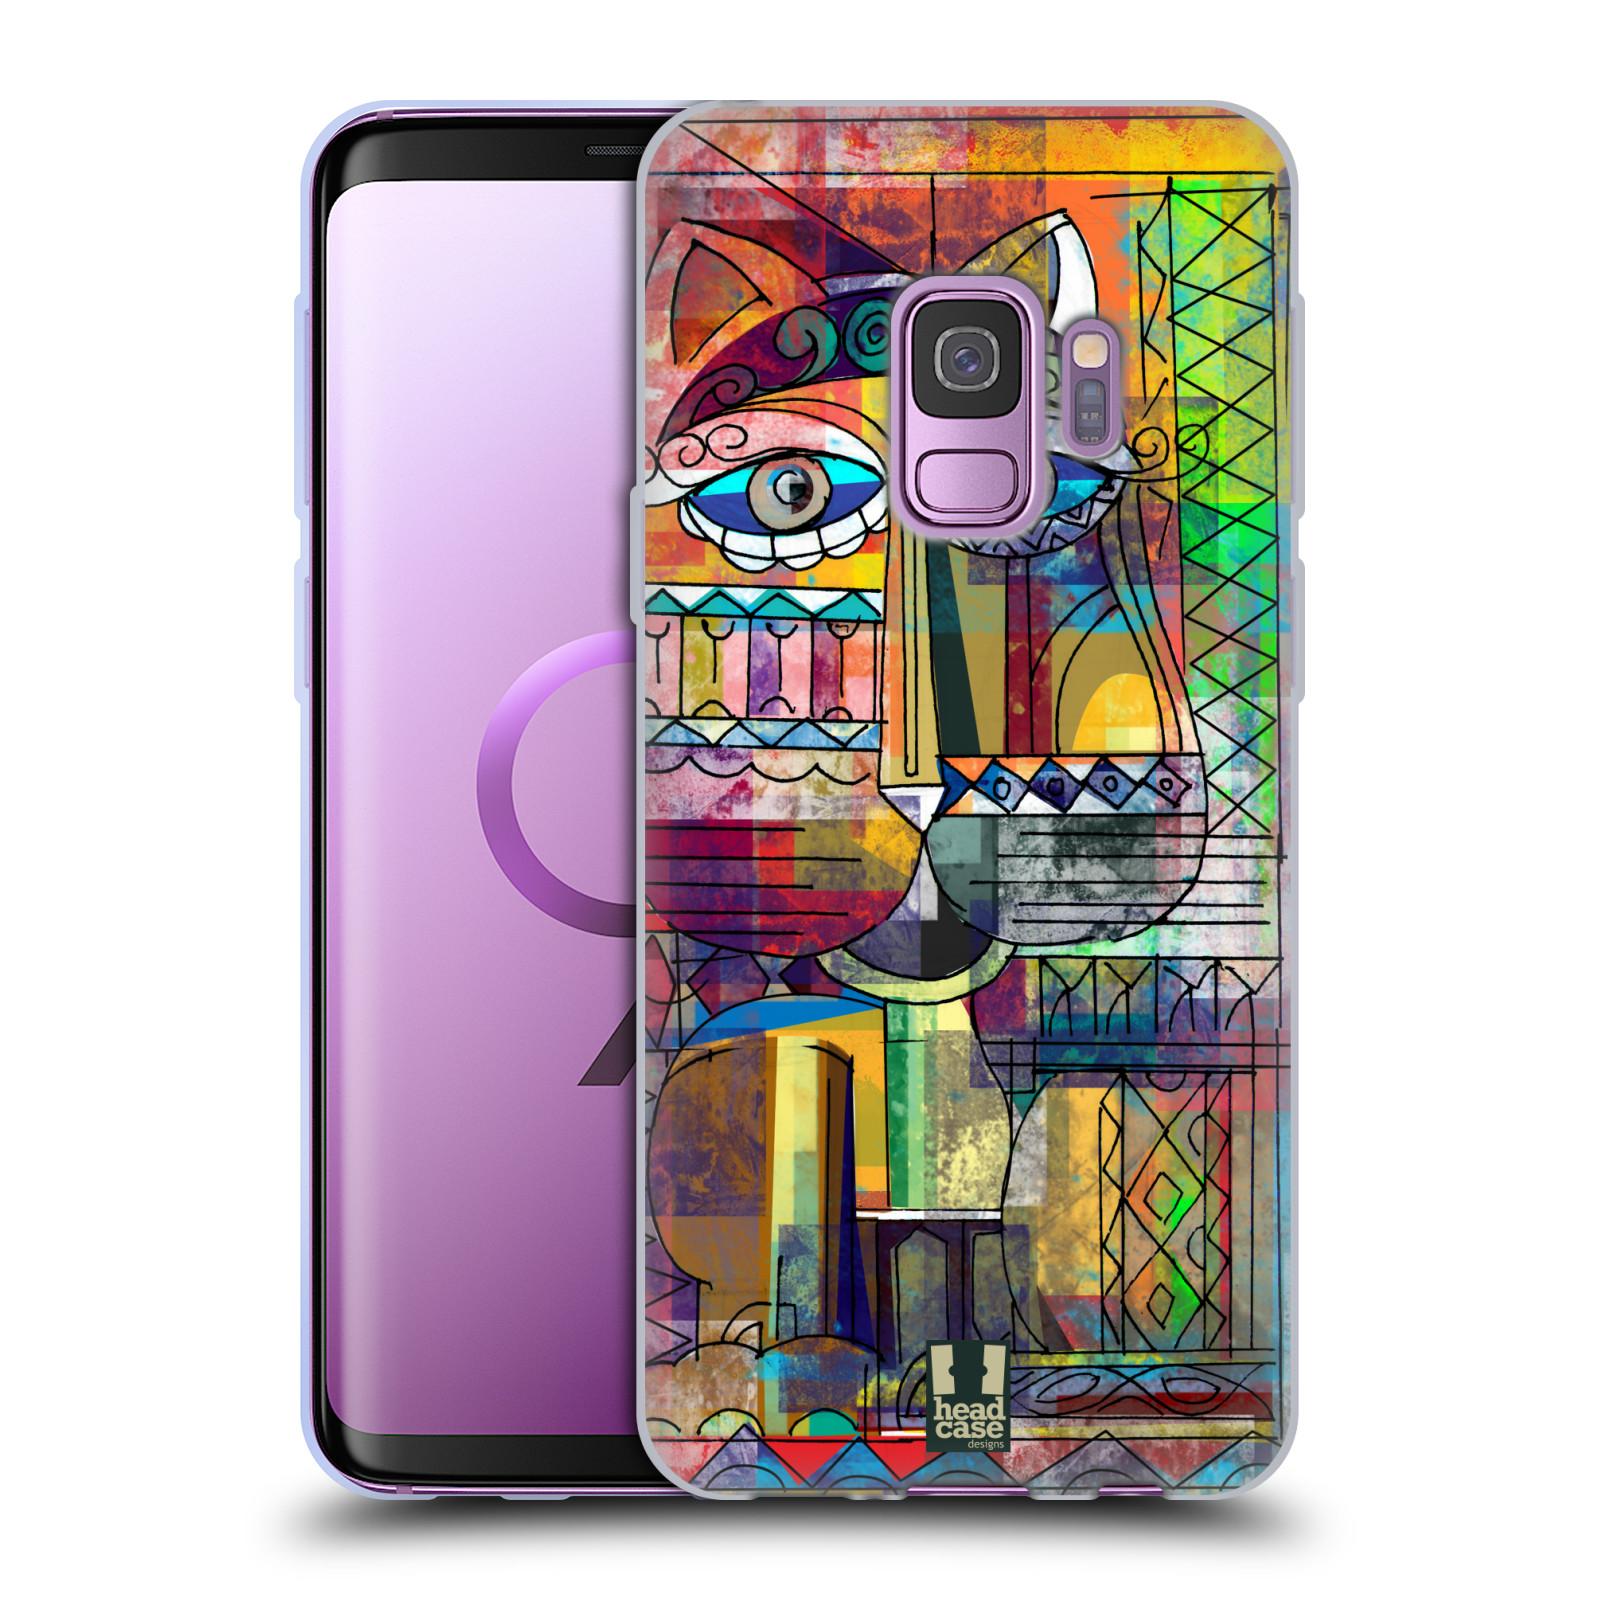 Silikonové pouzdro na mobil Samsung Galaxy S9 - Head Case - AZTEC KORAT